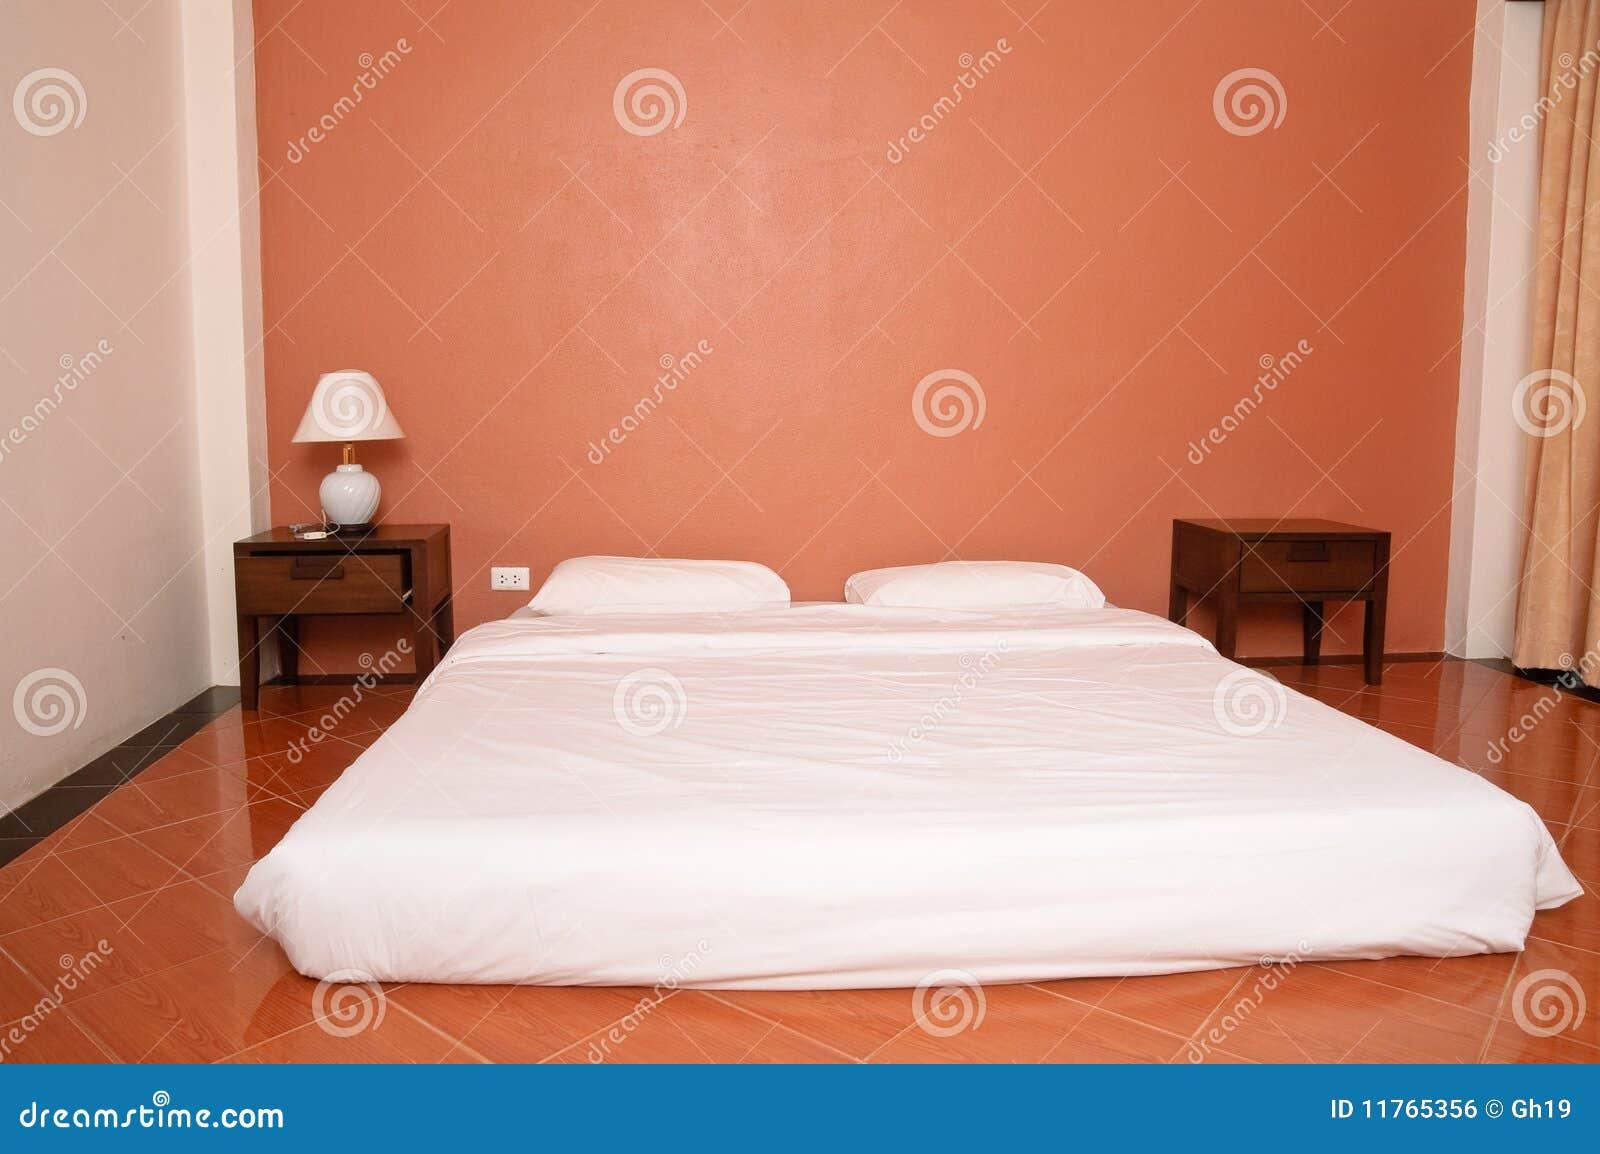 Sleeping room. Sleeping Room Royalty Free Stock Image   Image  11765356